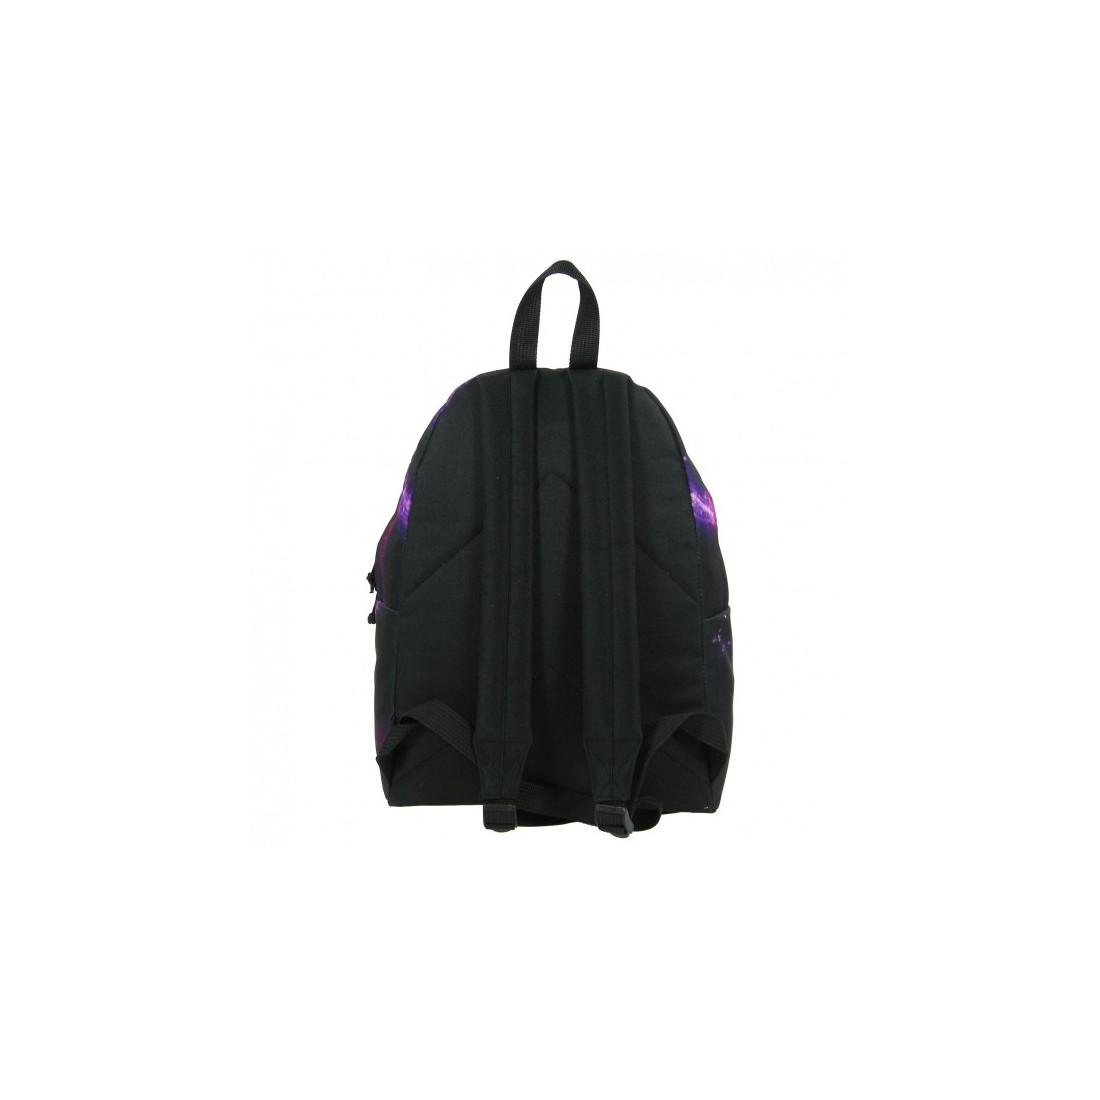 Plecak młodzieżowy Fullprint Smudge - plecak-tornister.pl